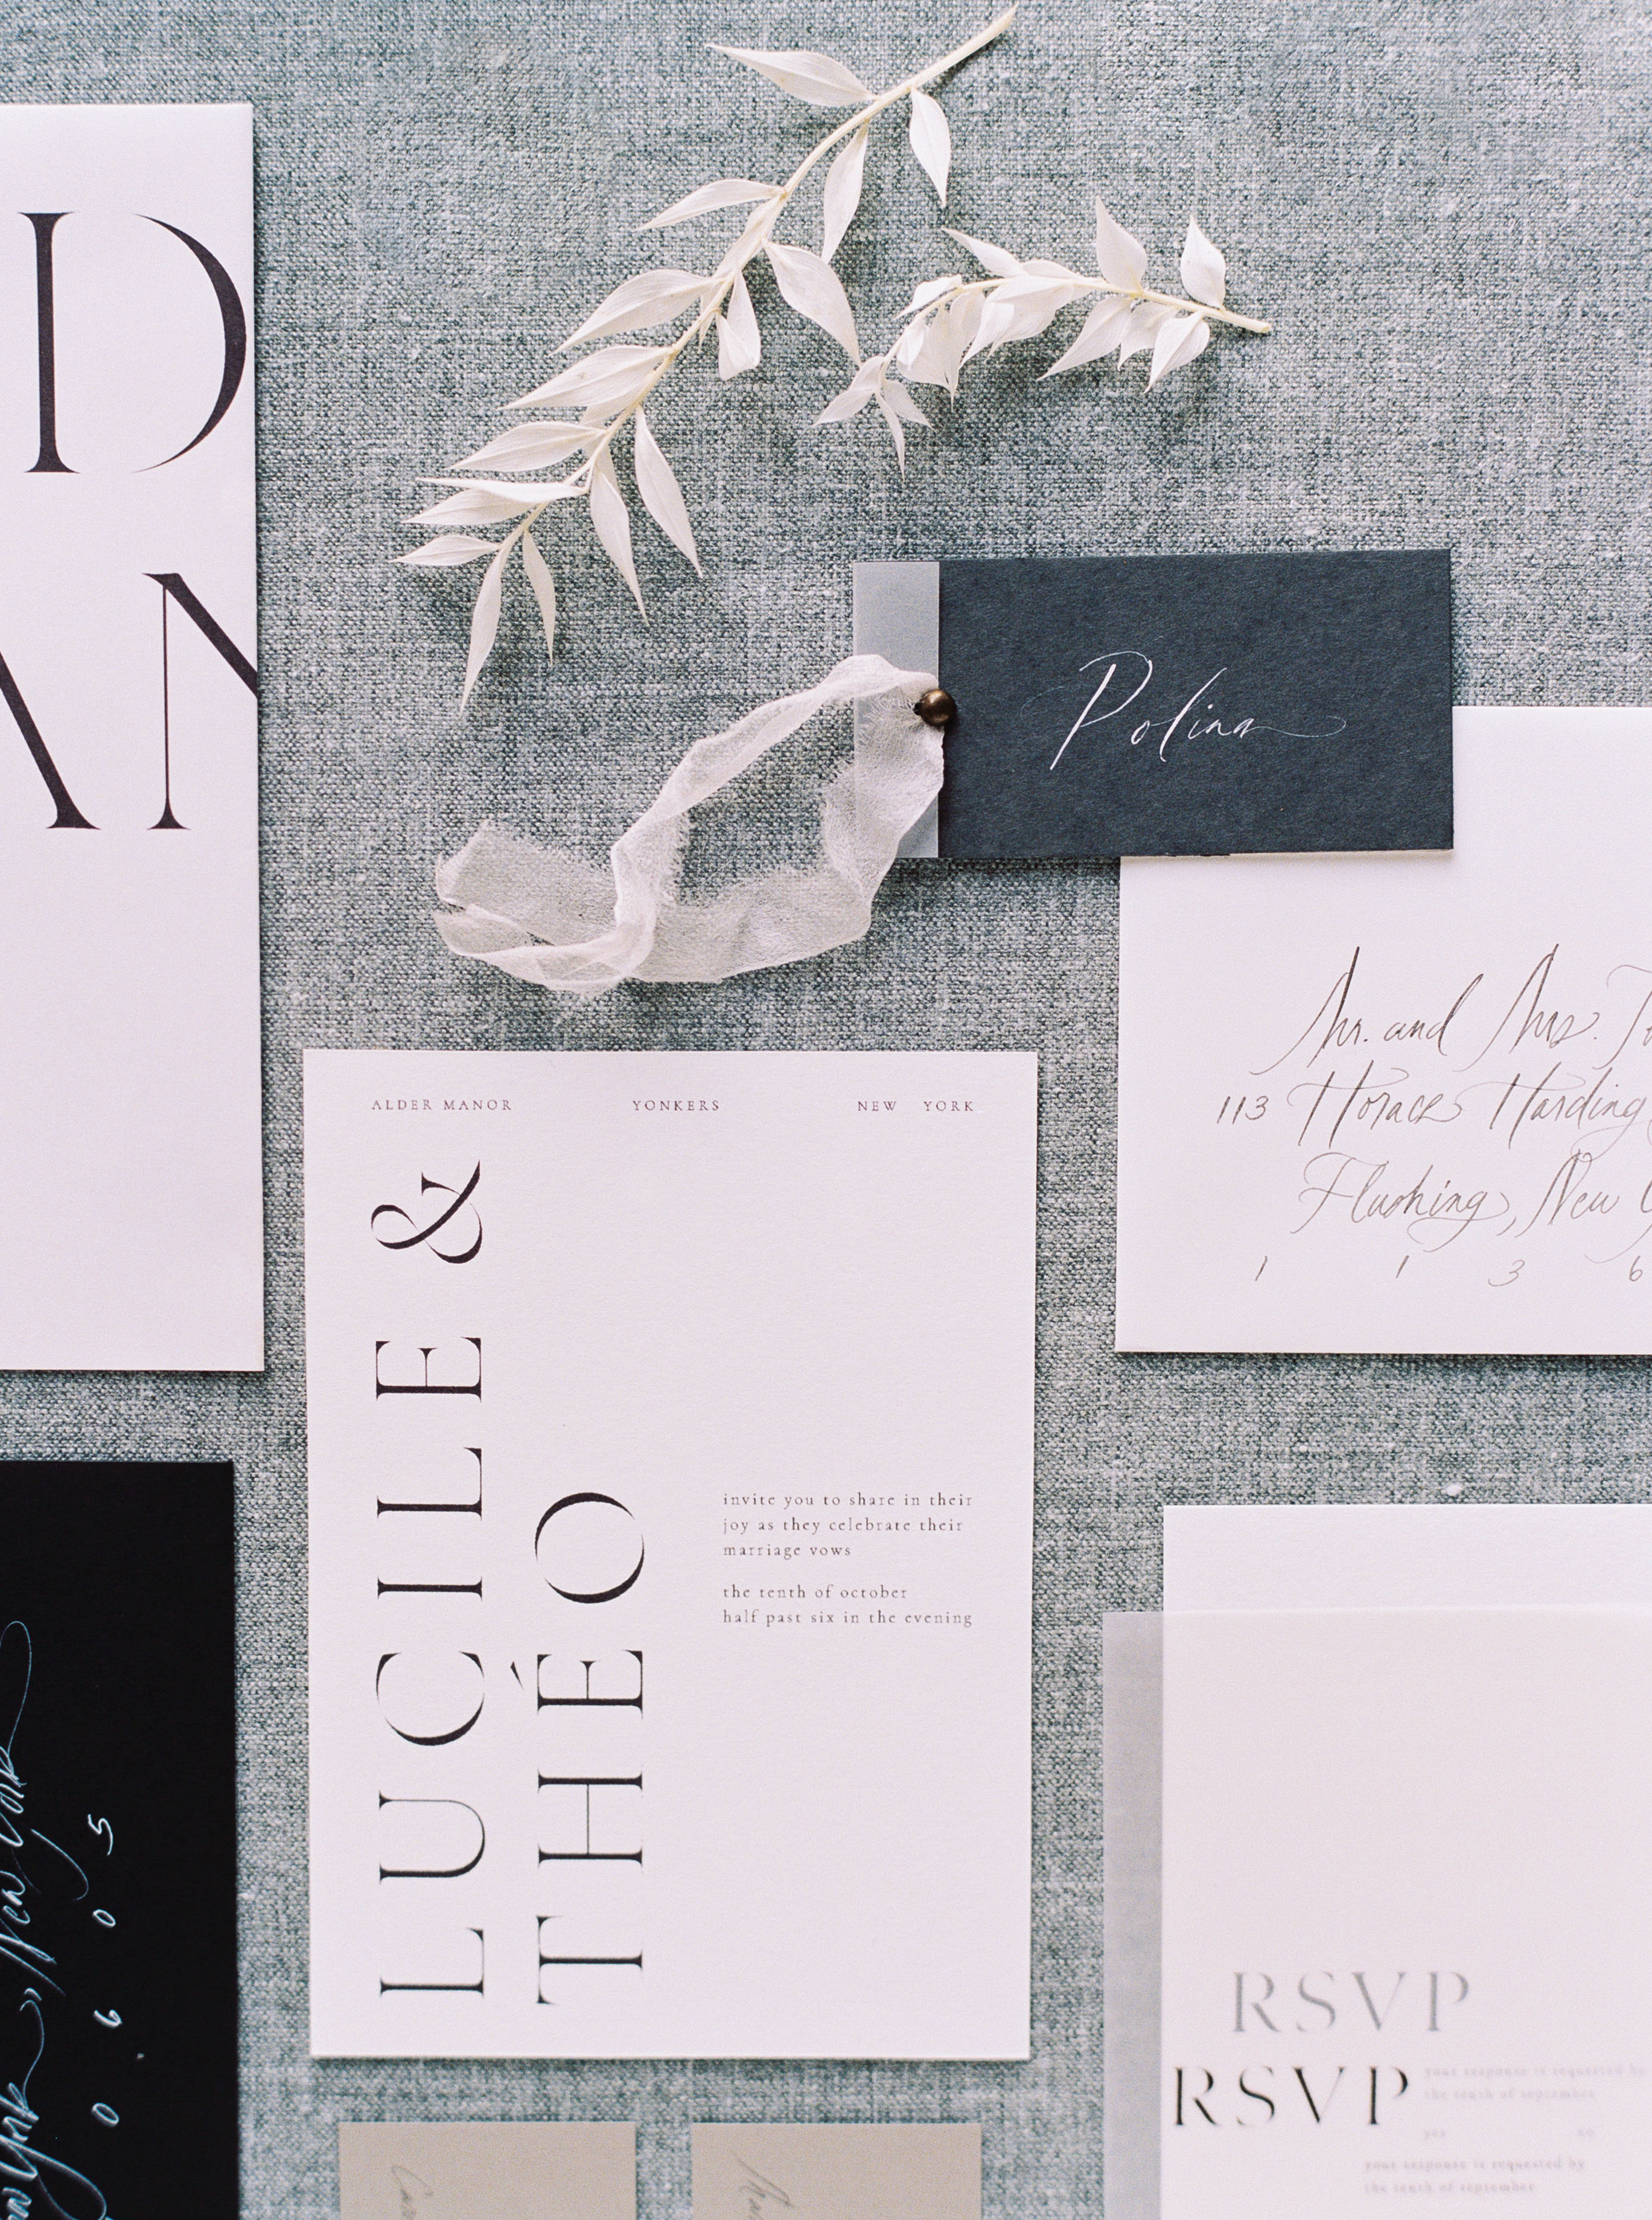 wedding invitation negative space bold capitalized names